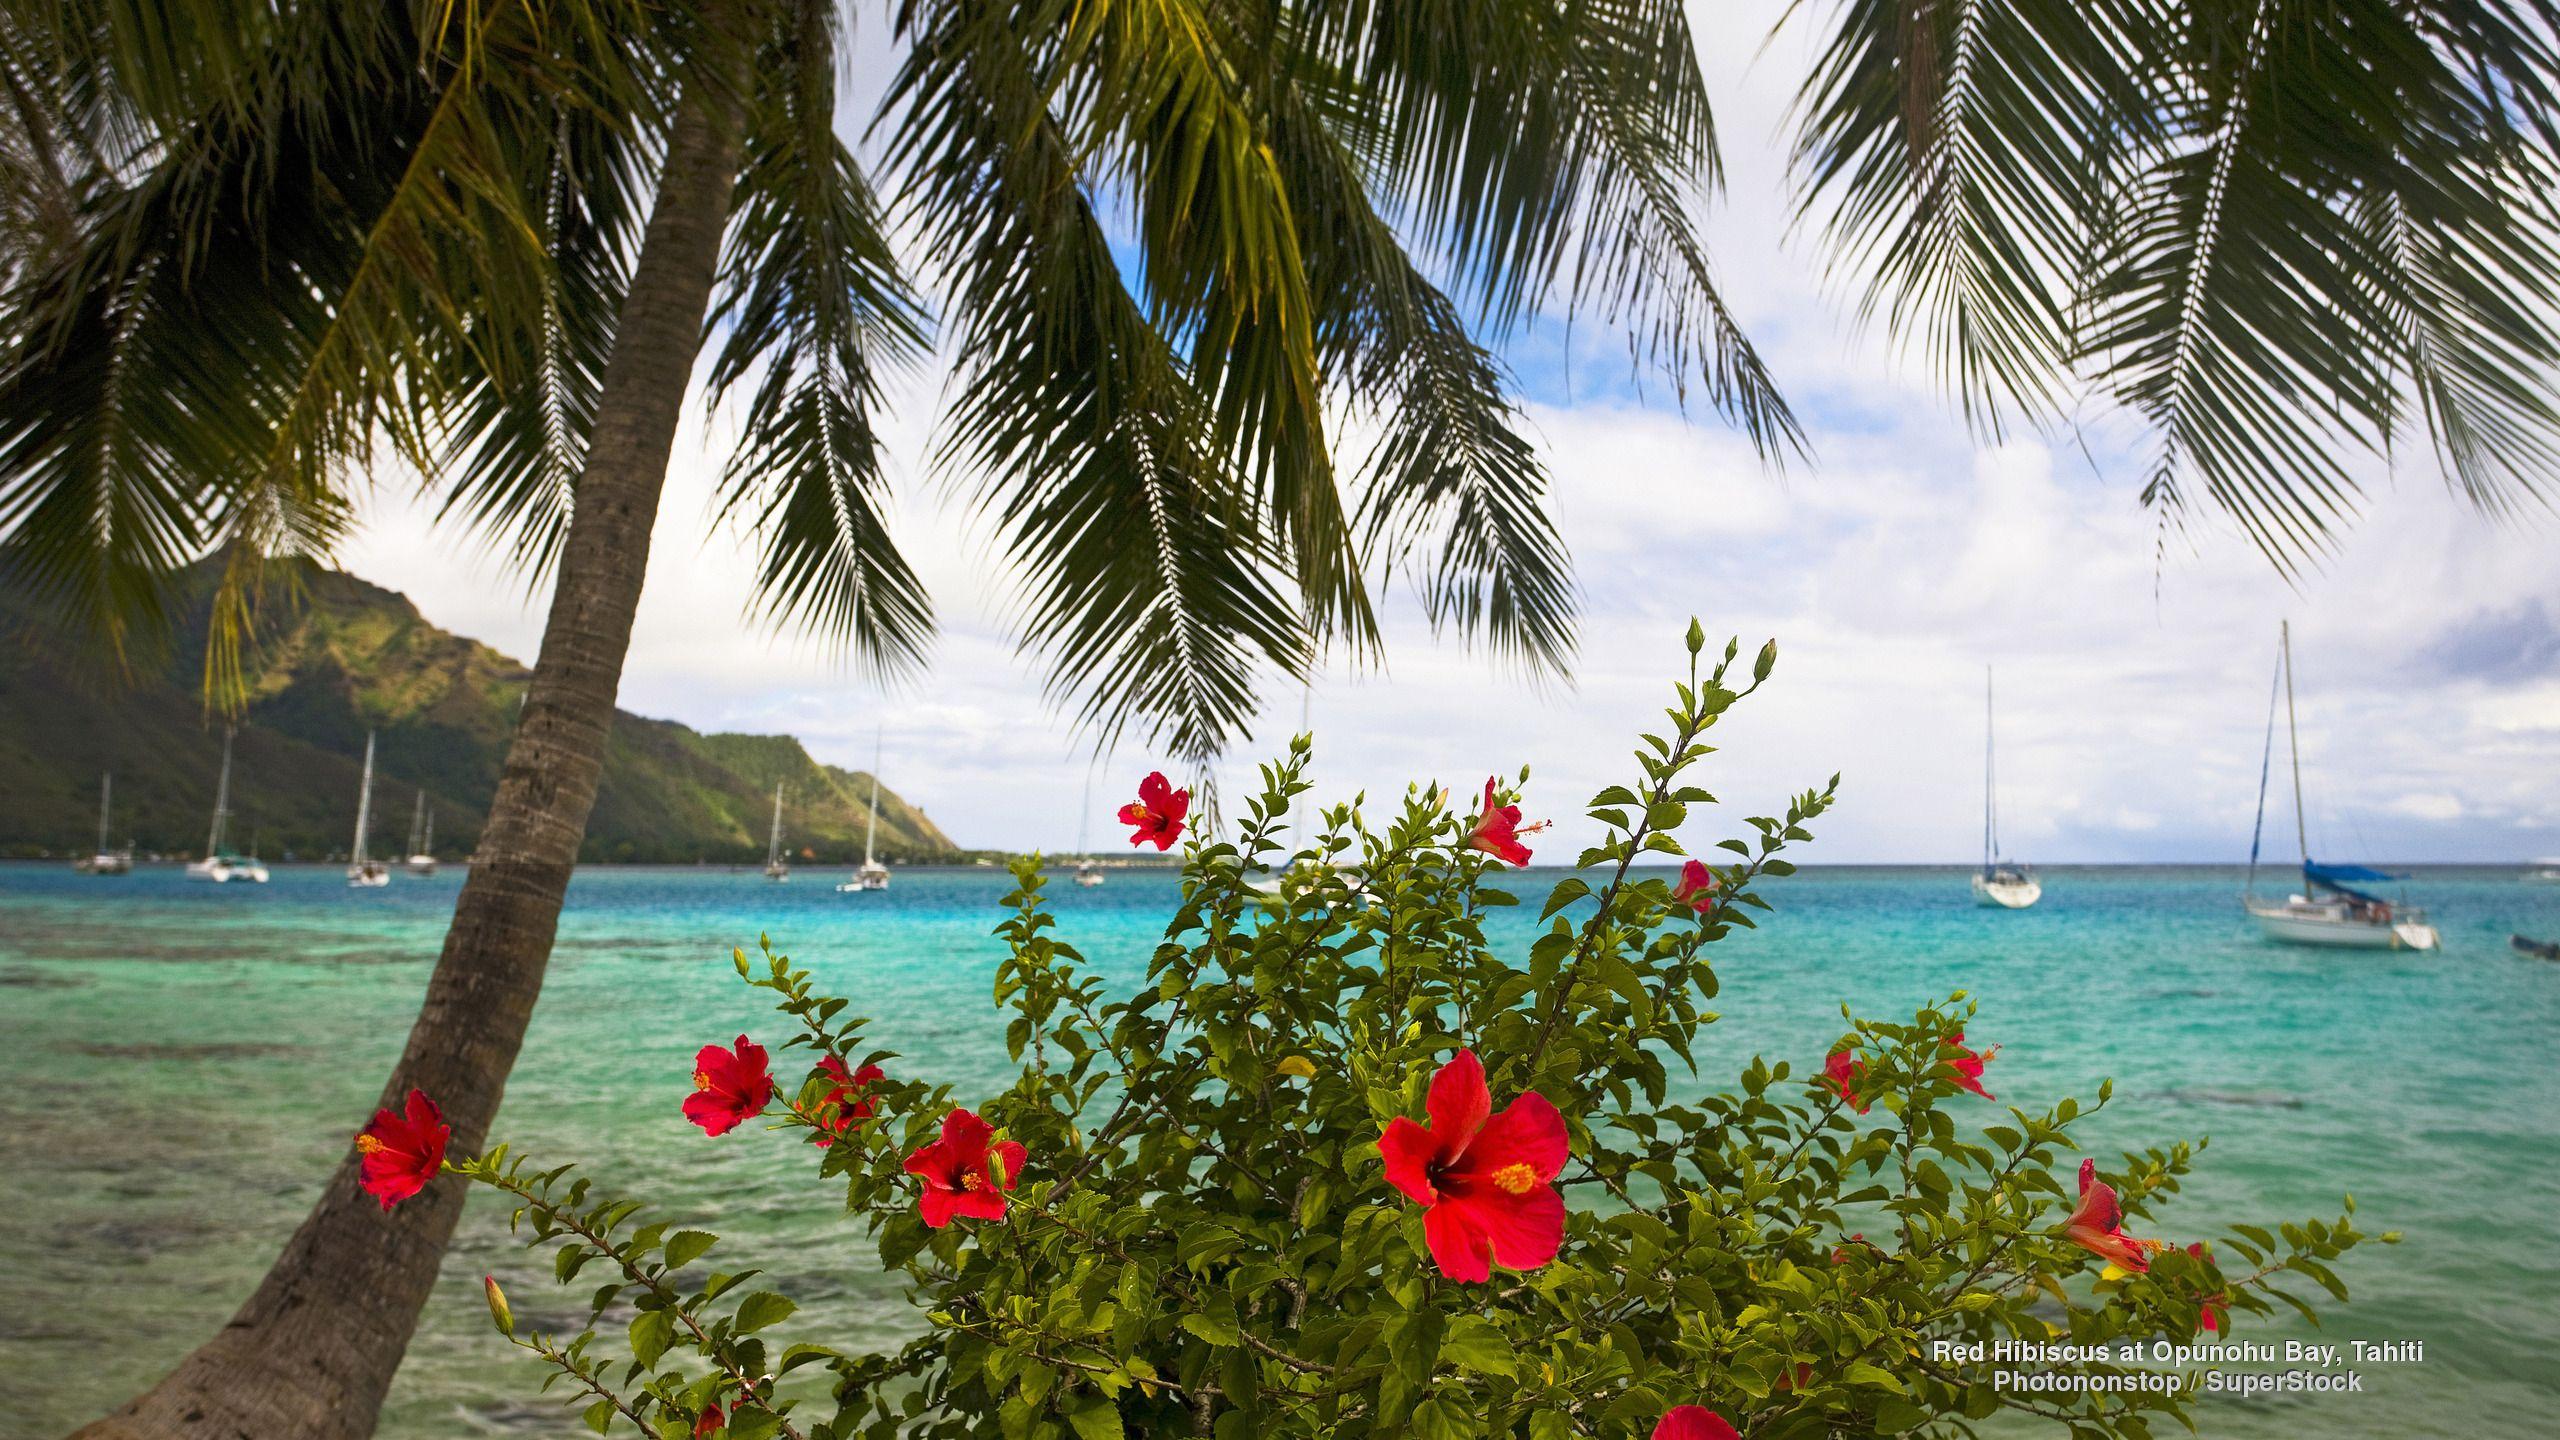 Red hibiscus at opunohu bay tahiti hd wallpaper background image 2560x1440 id 686440 - Free palm tree screensavers ...